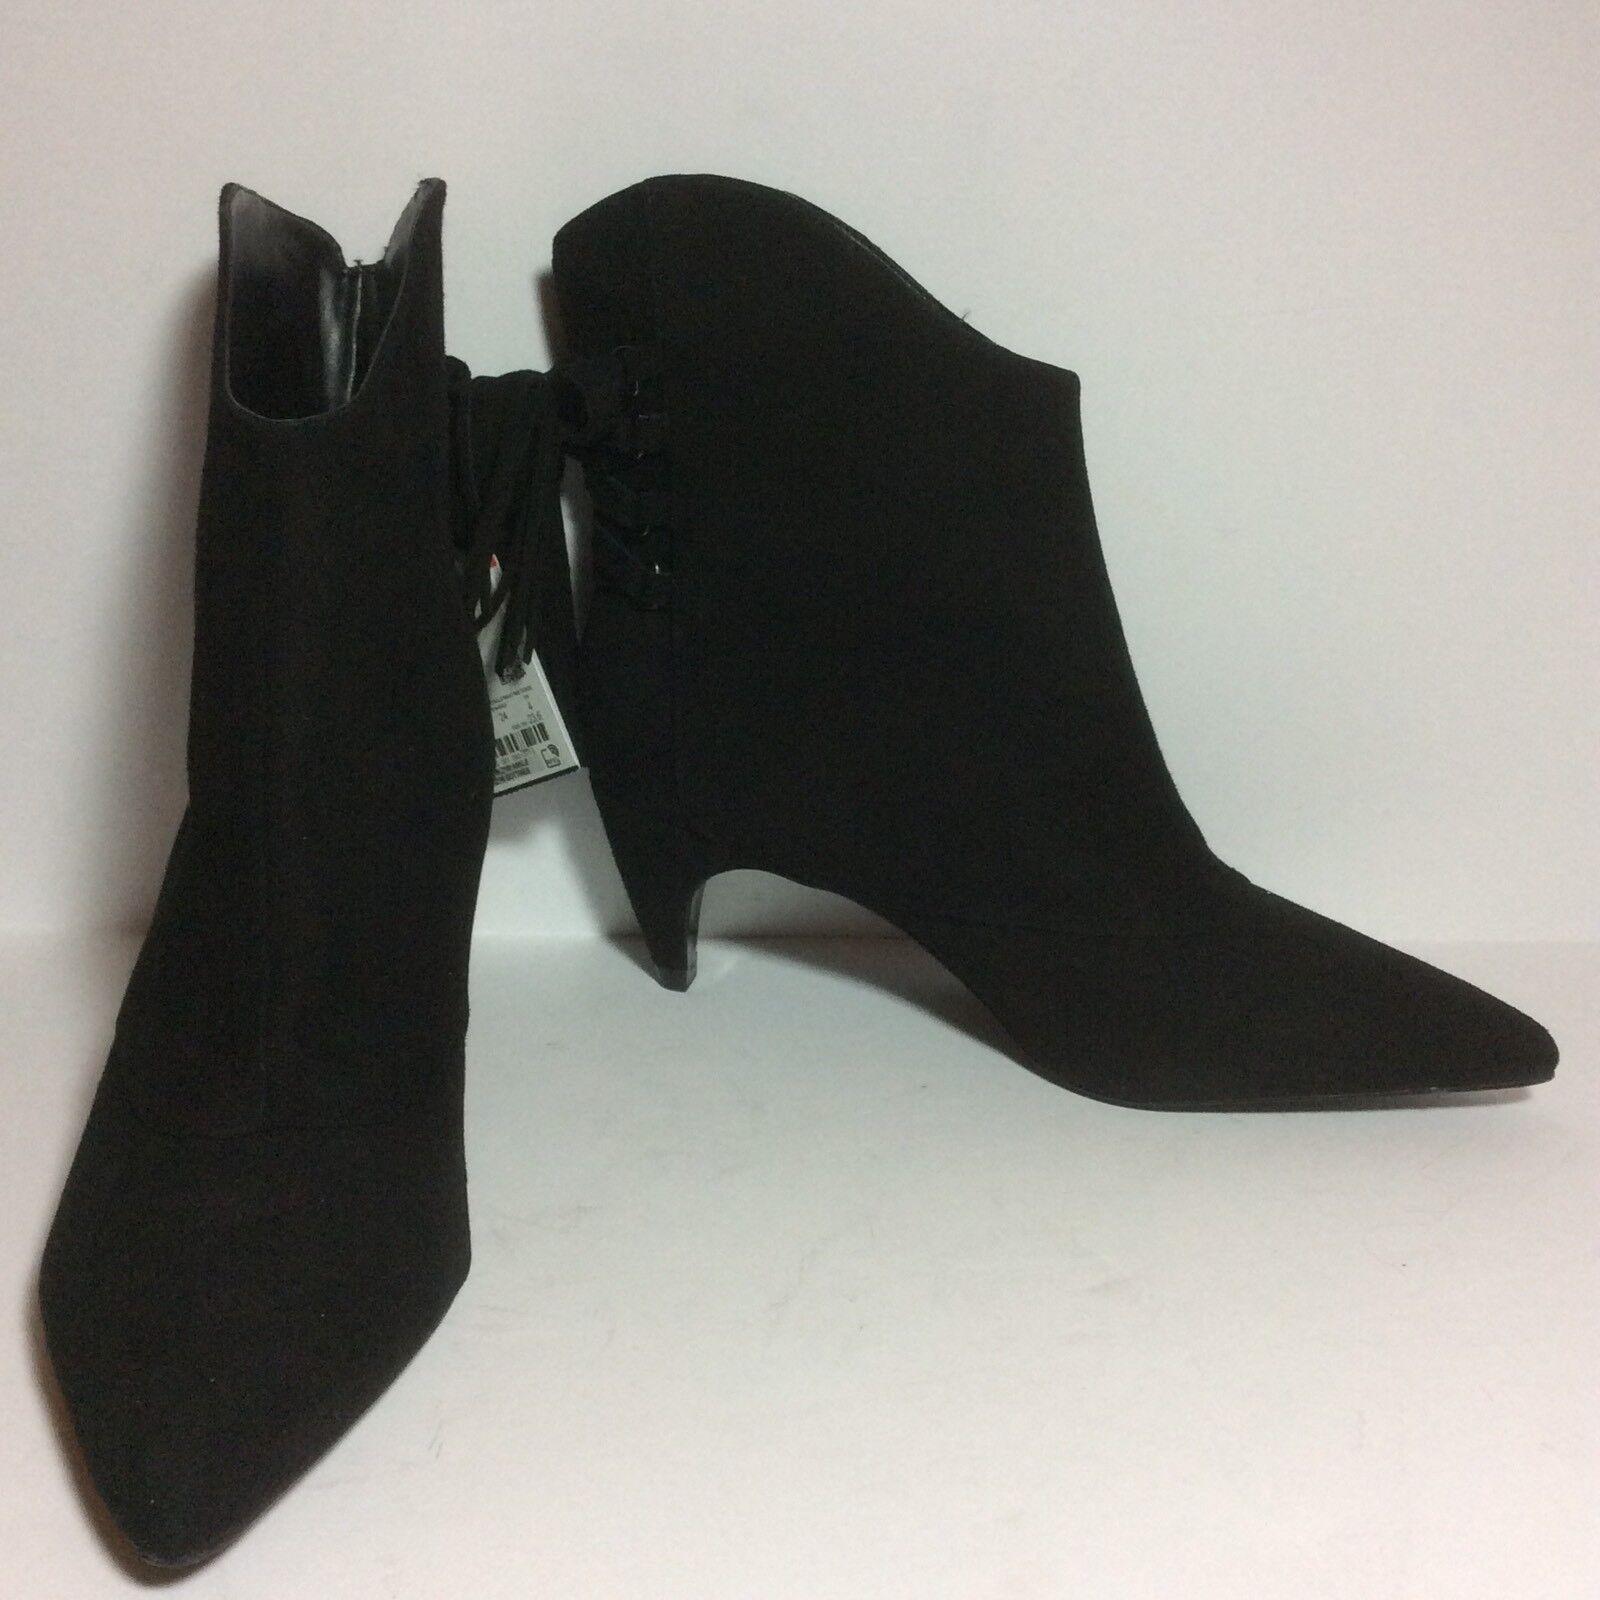 NWT Zara Black Suede Mid High Tassel Ankle Bootie SZ 6.5 37 HTF